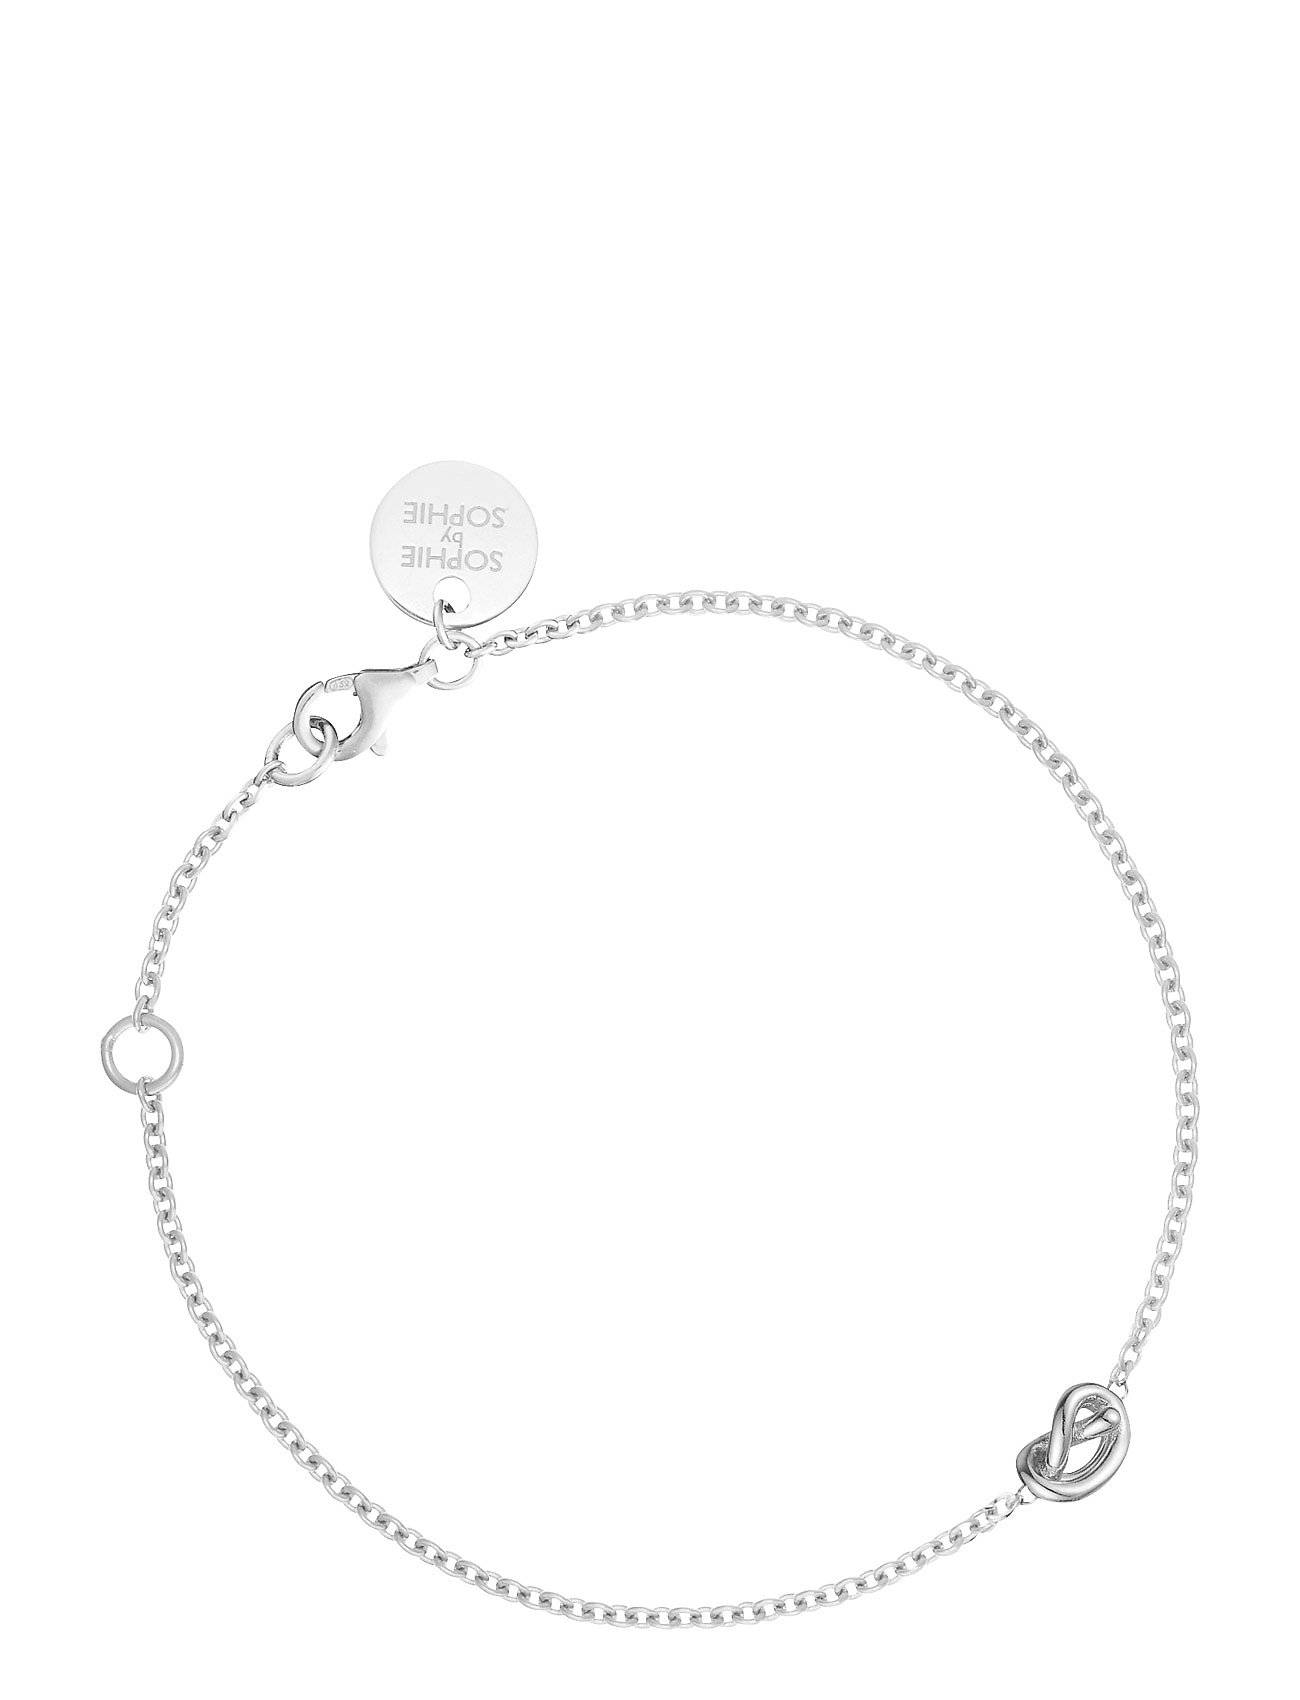 SOPHIE by SOPHIE Knot Bracelet Accessories Jewellery Bracelets Chain Bracelets Hopea SOPHIE By SOPHIE